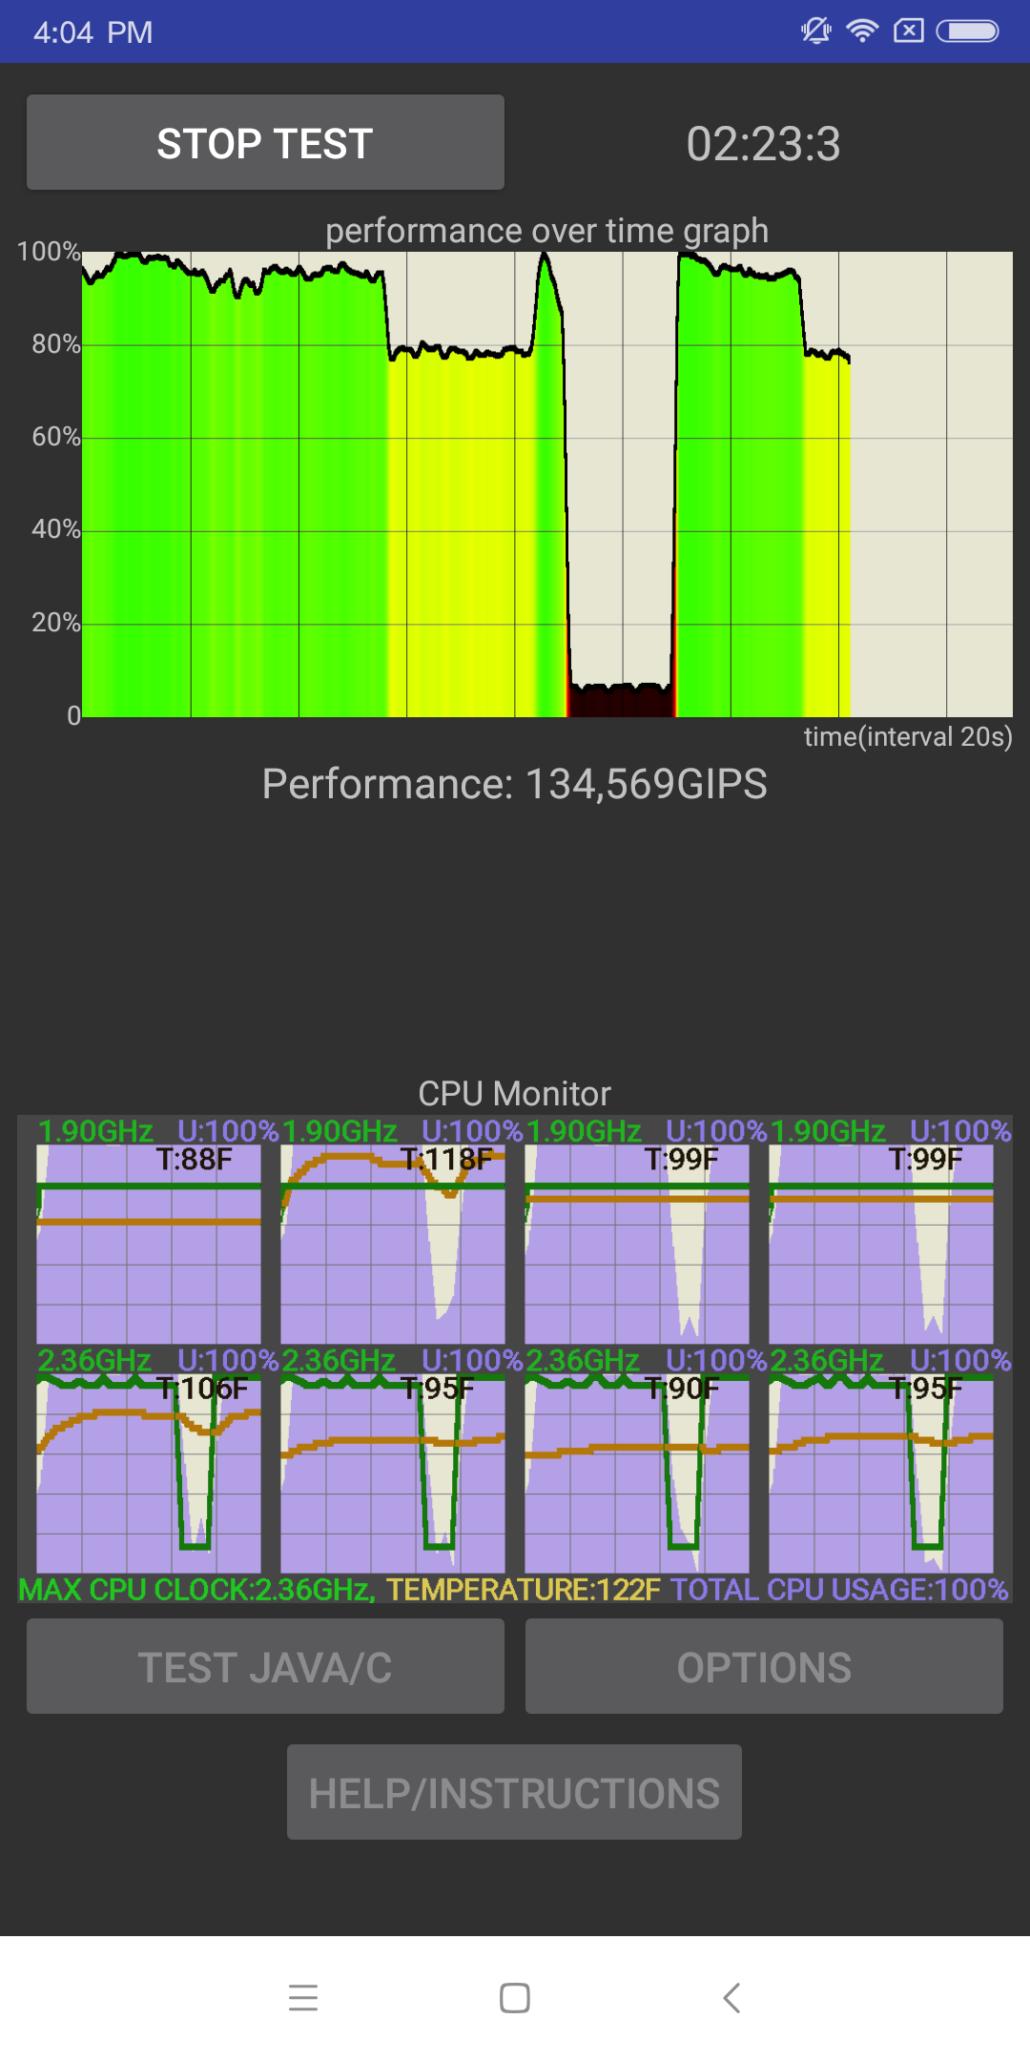 screenshot_2018-01-29-16-04-20-471_skynet-cputhrottlingtest